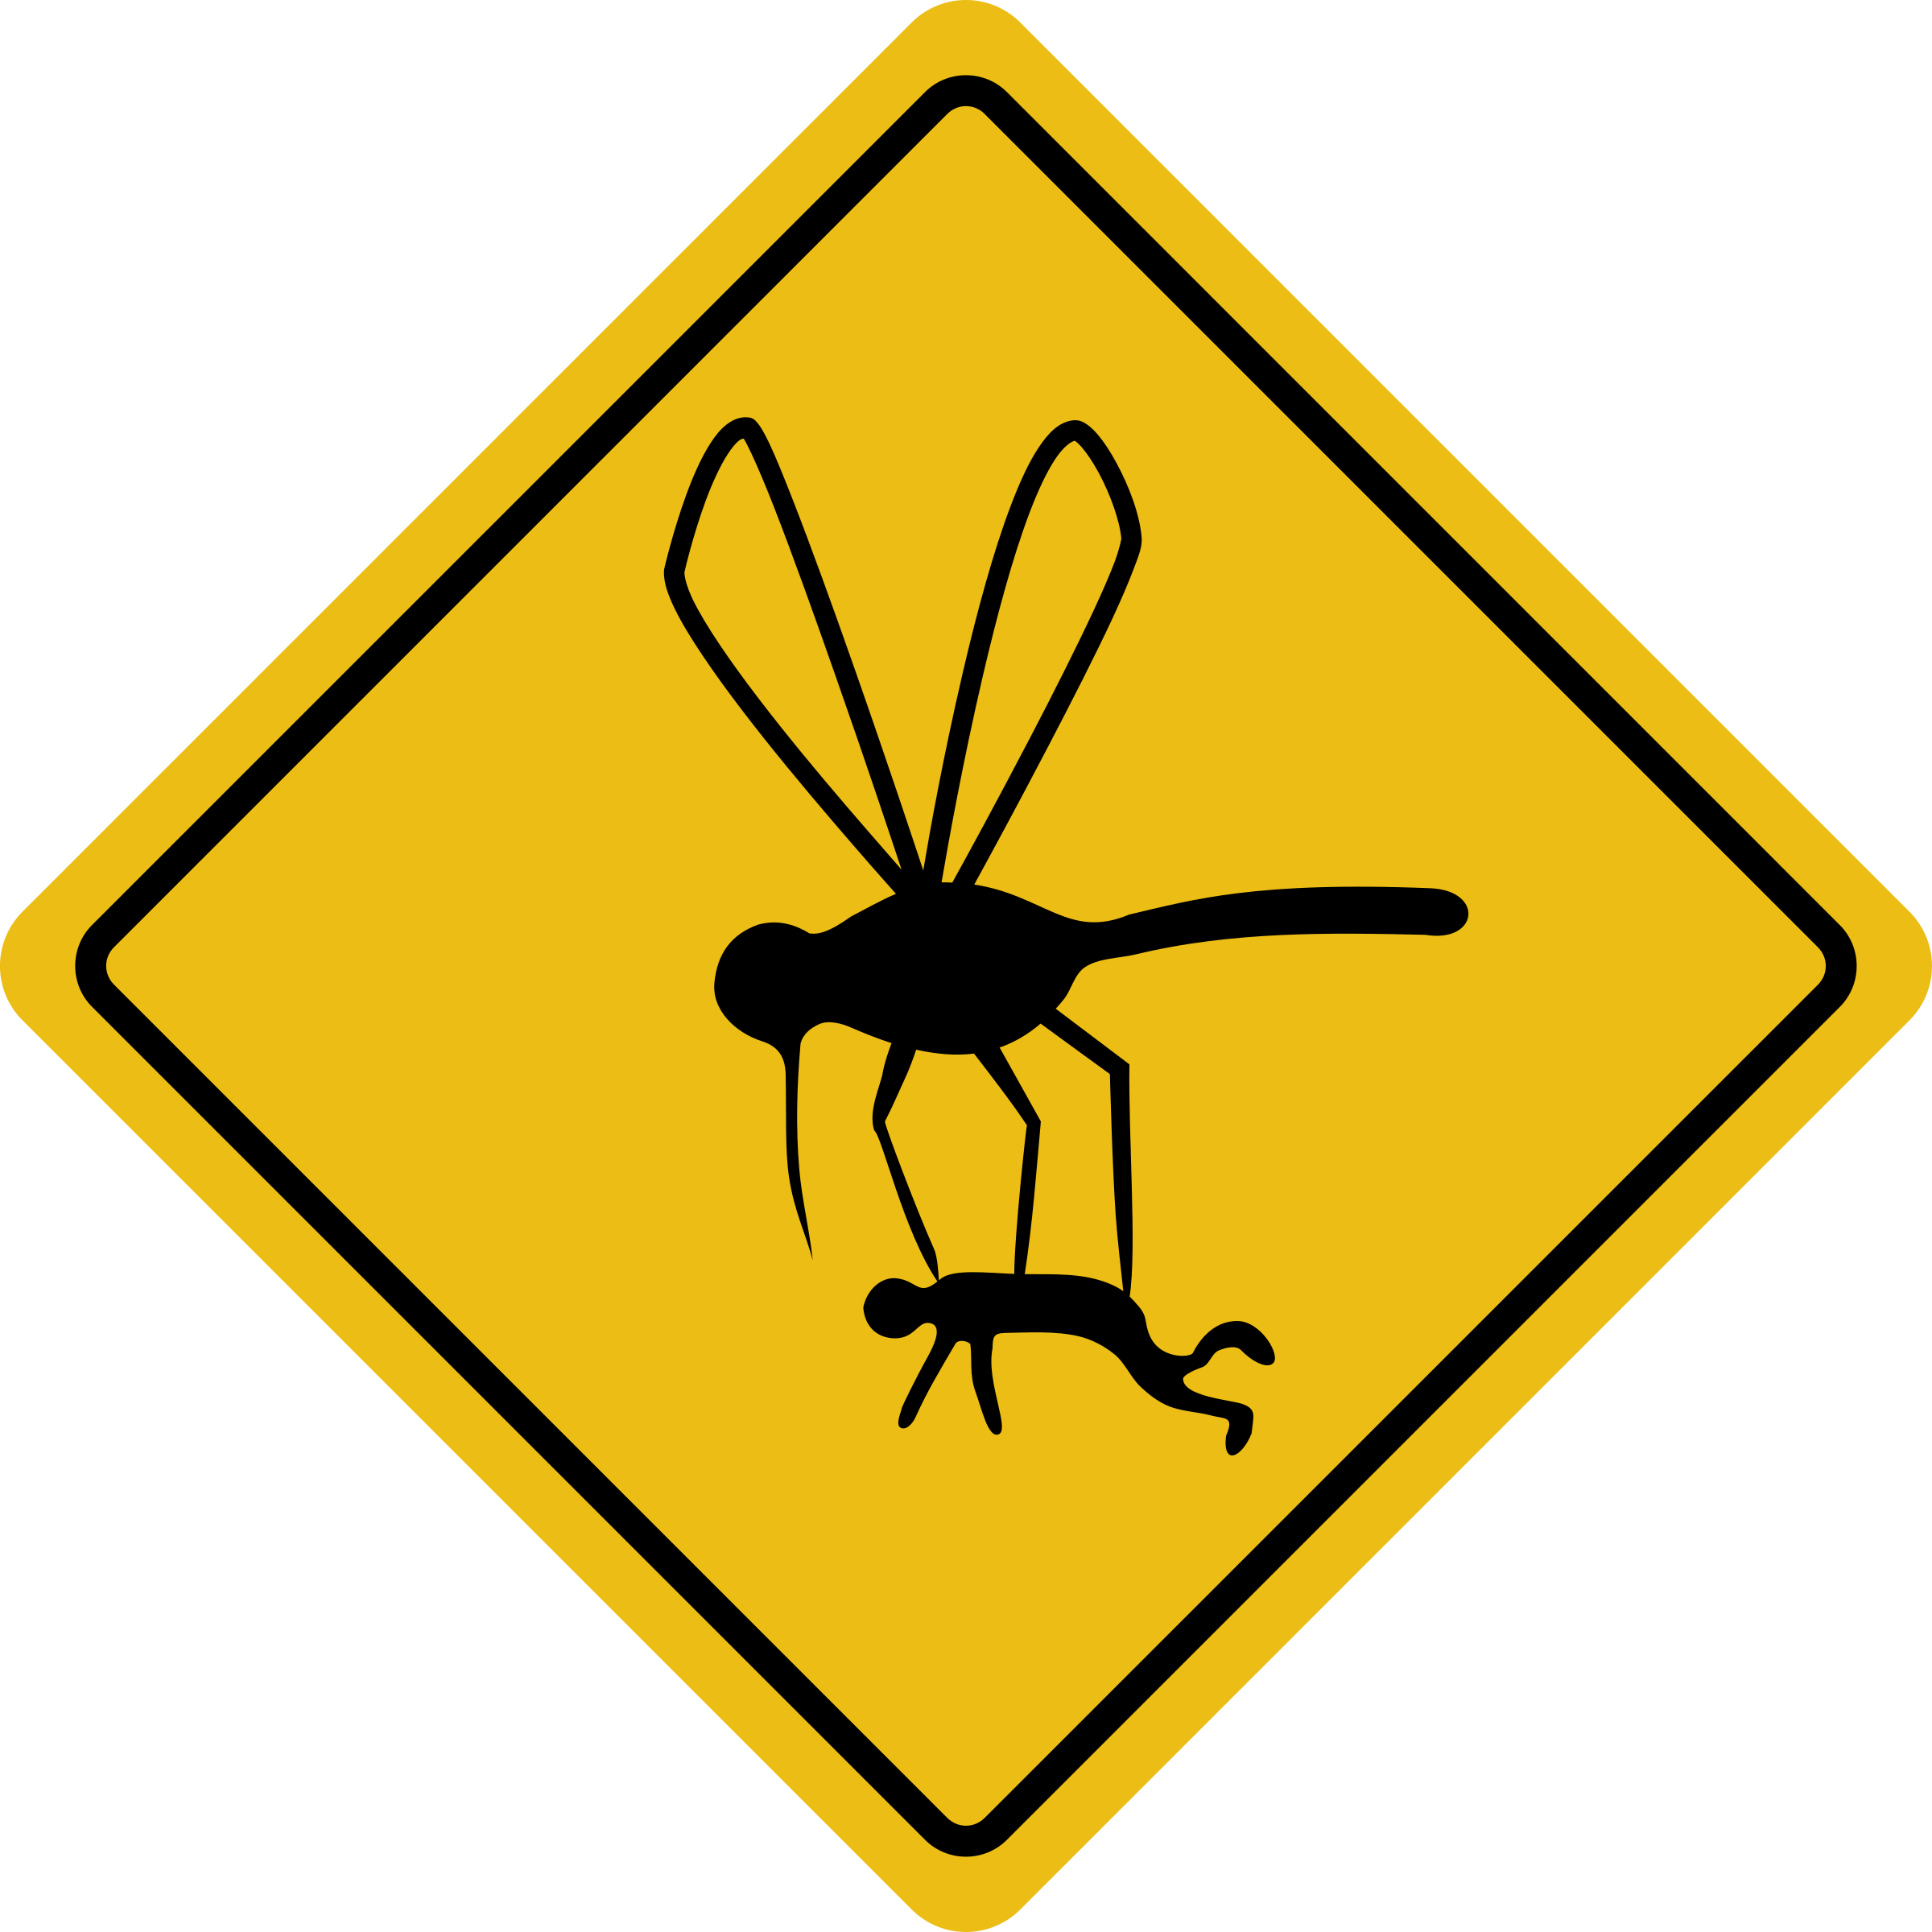 Clipart mosquito hazard